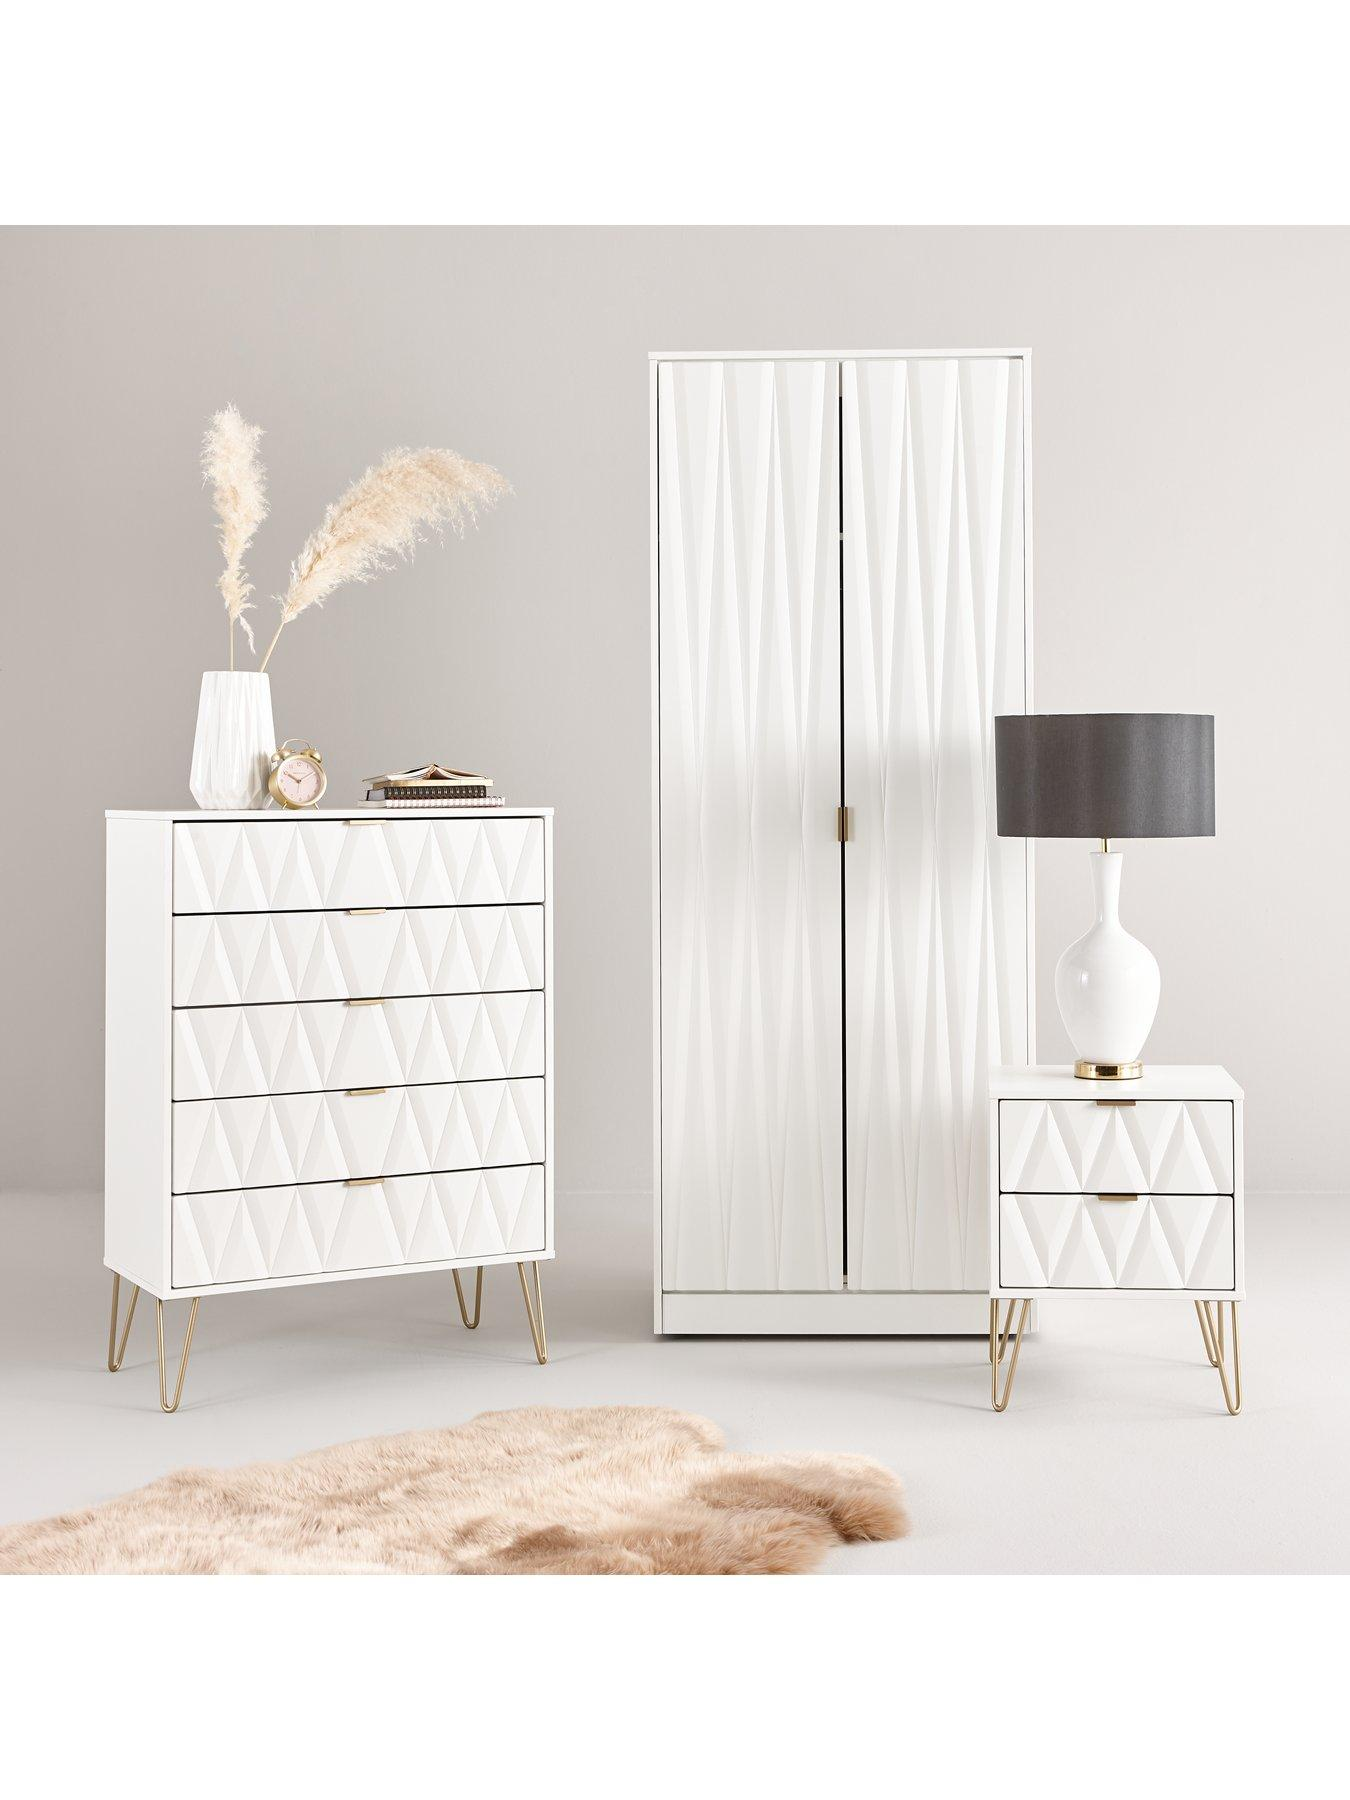 Best Swift Versailles Ready Assembled 2 Drawer Bedside Chest 400 x 300